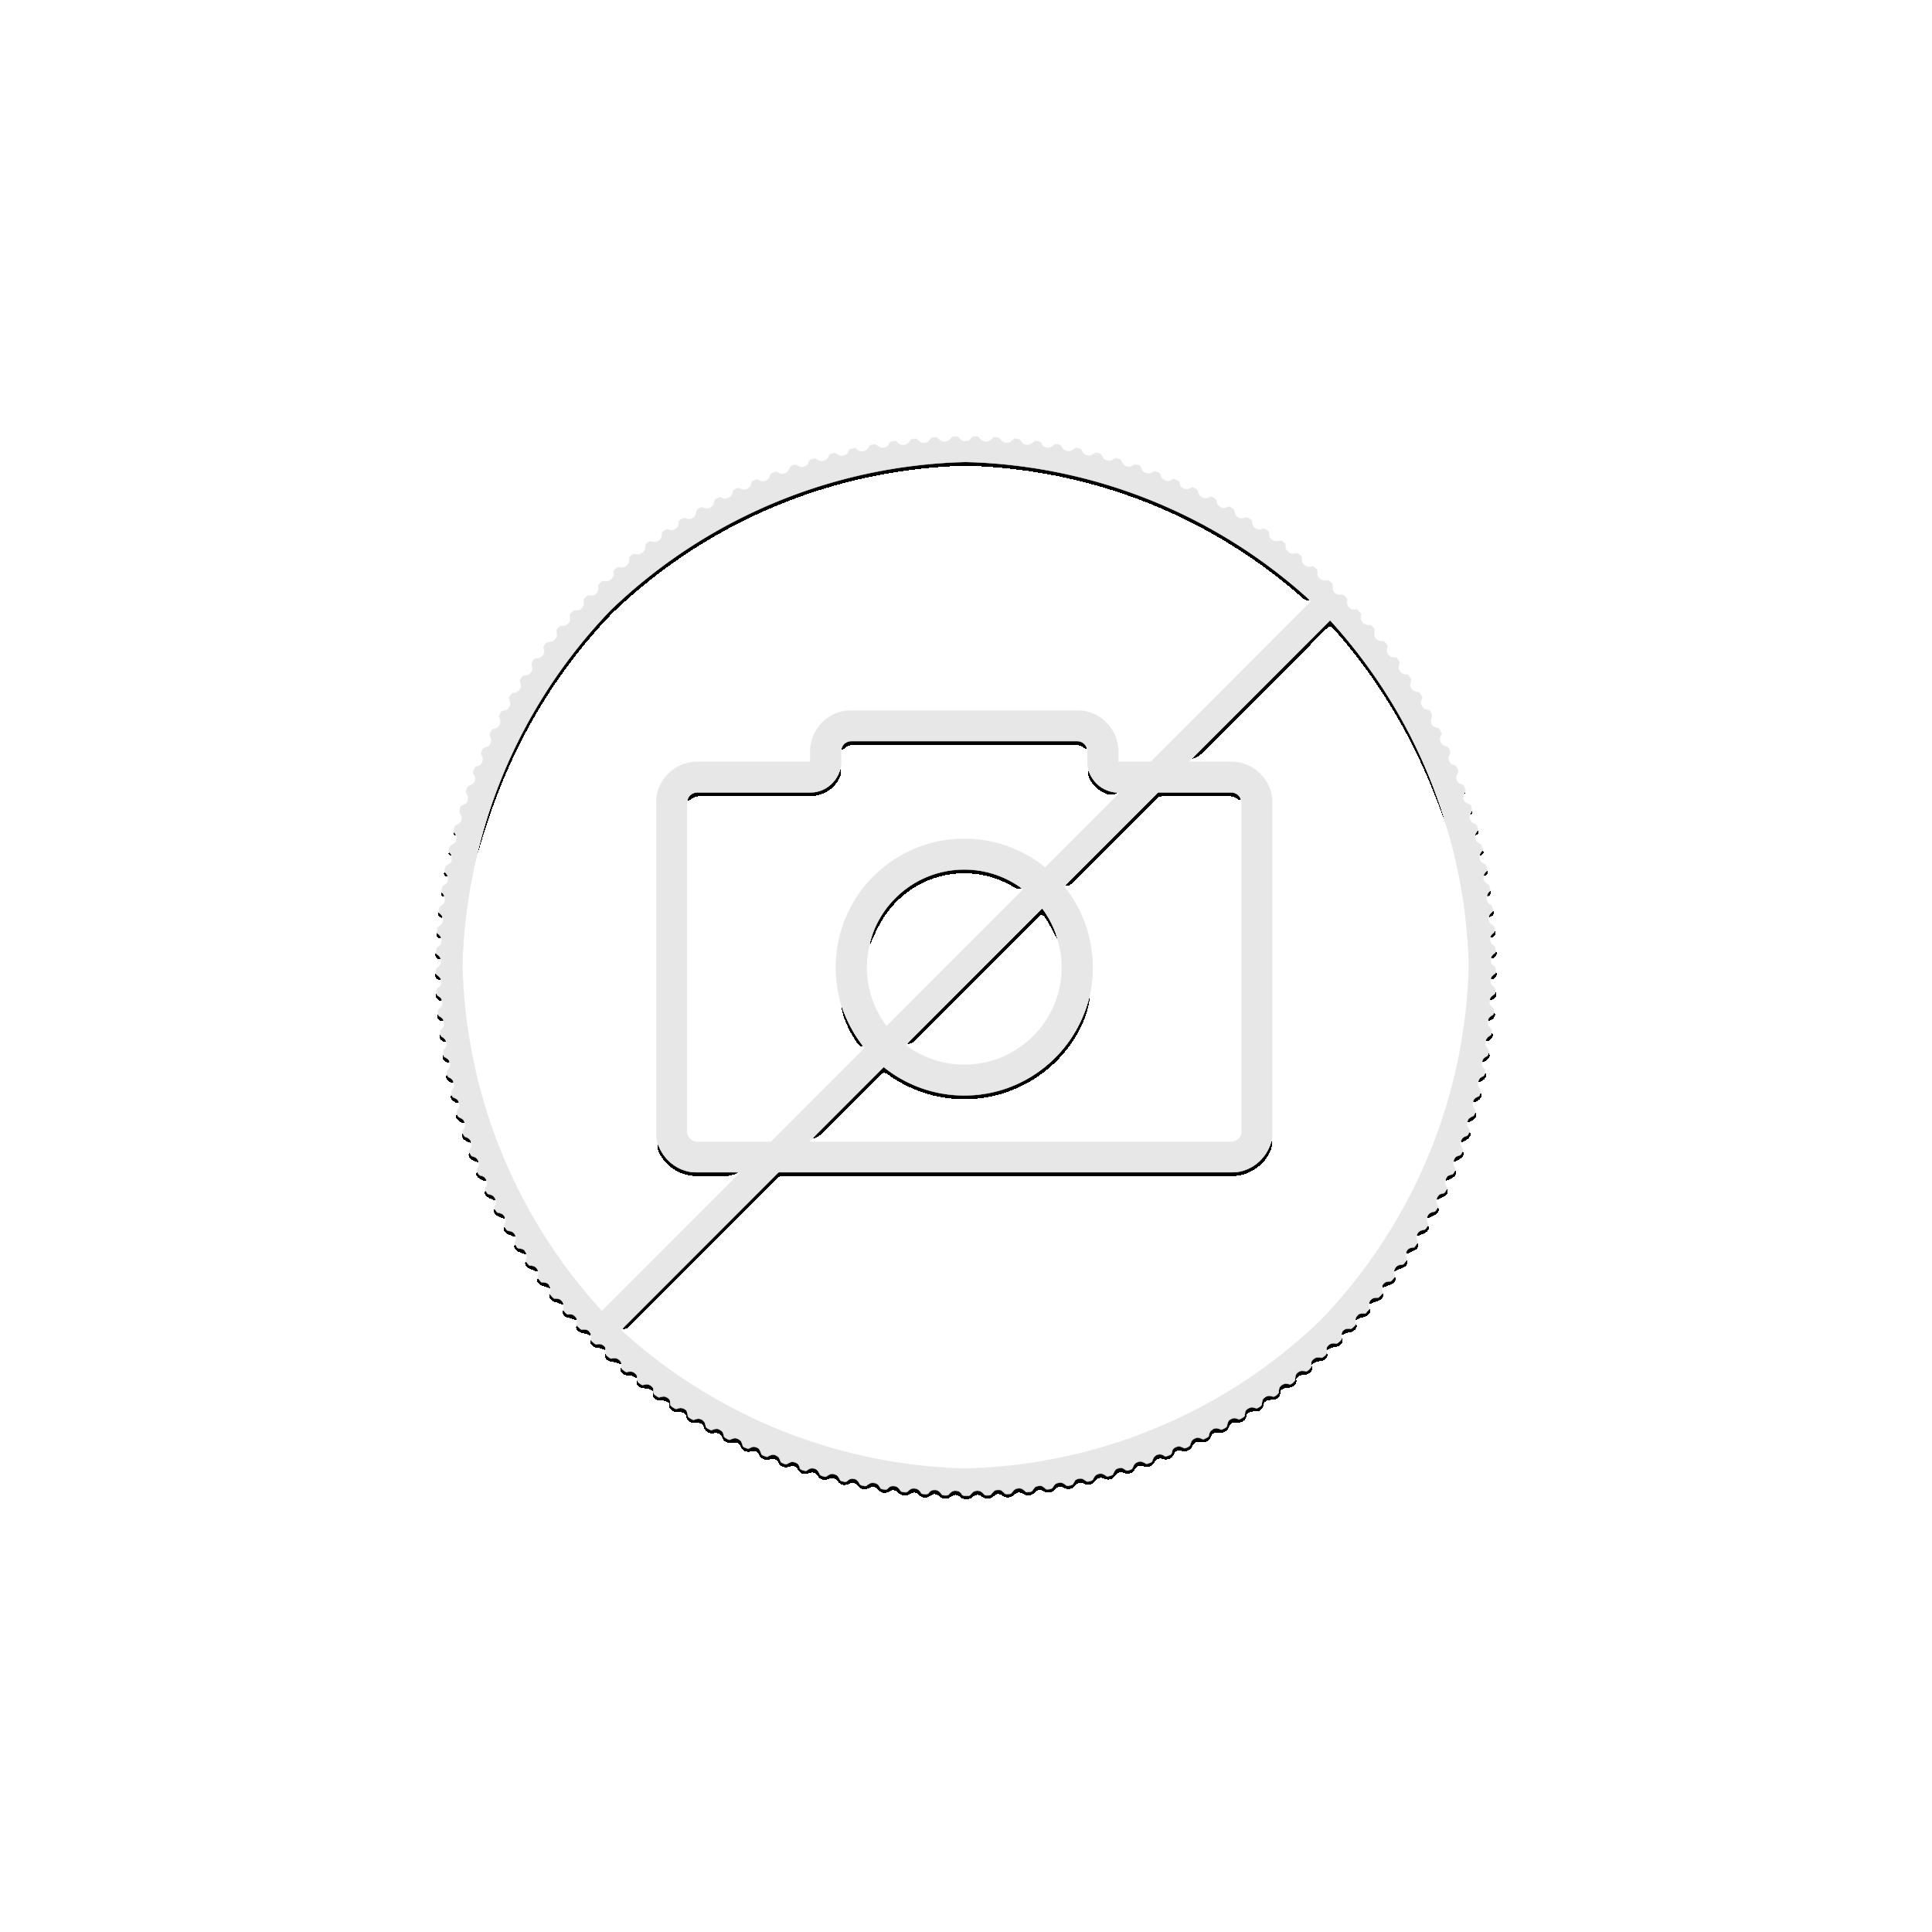 1/20 Troy ounce gold Maple Leaf coin 2019